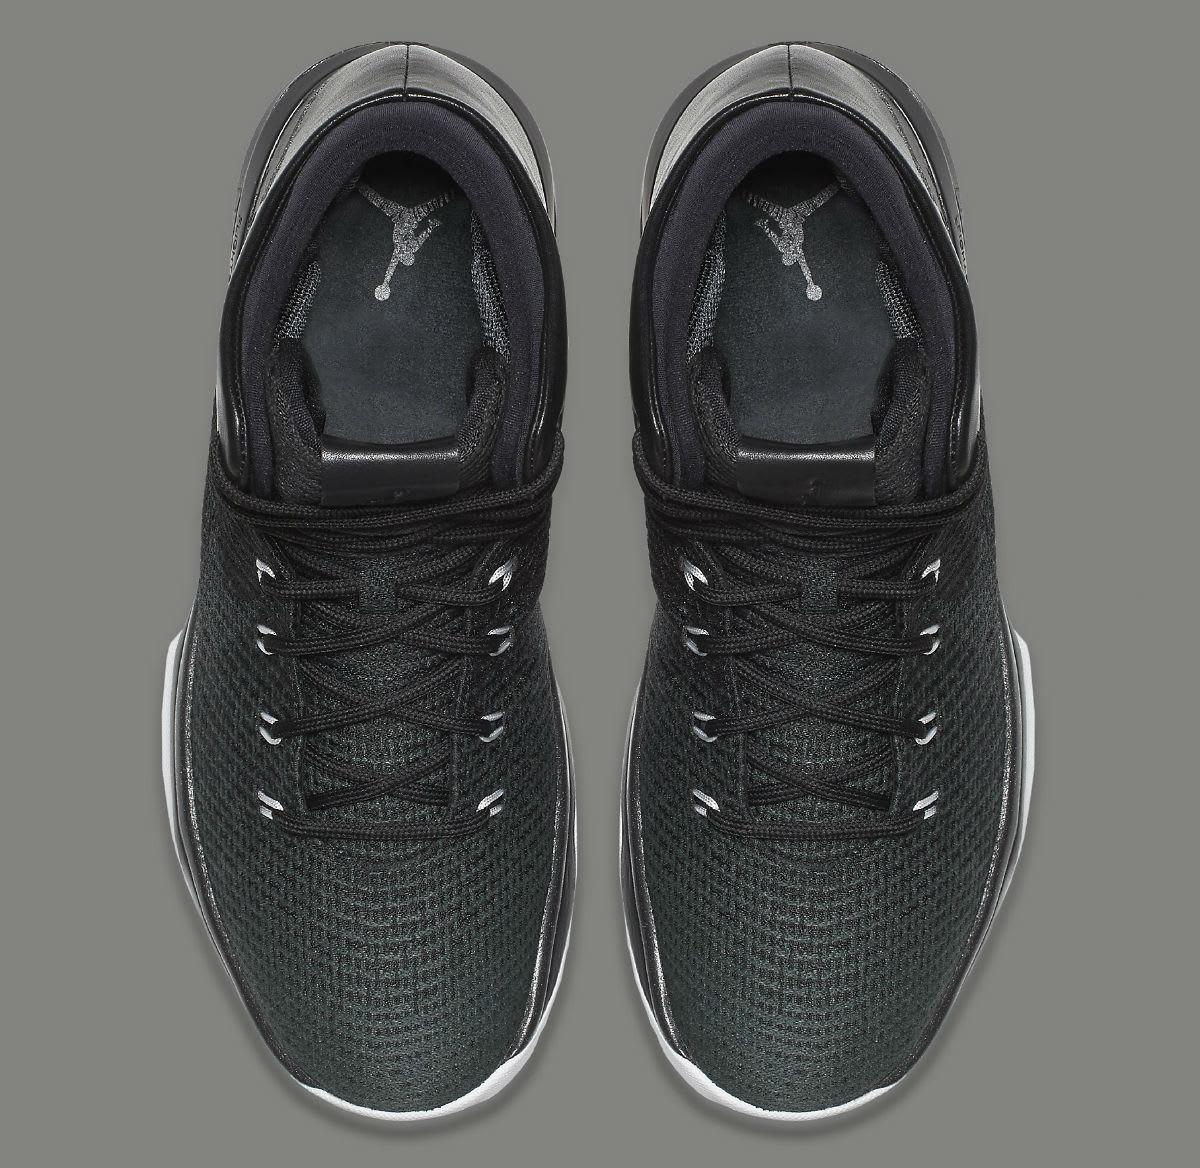 Cheap Air Jordan 9 Retro Size 12 White True Red Black Space Jam 302370 112 NIB